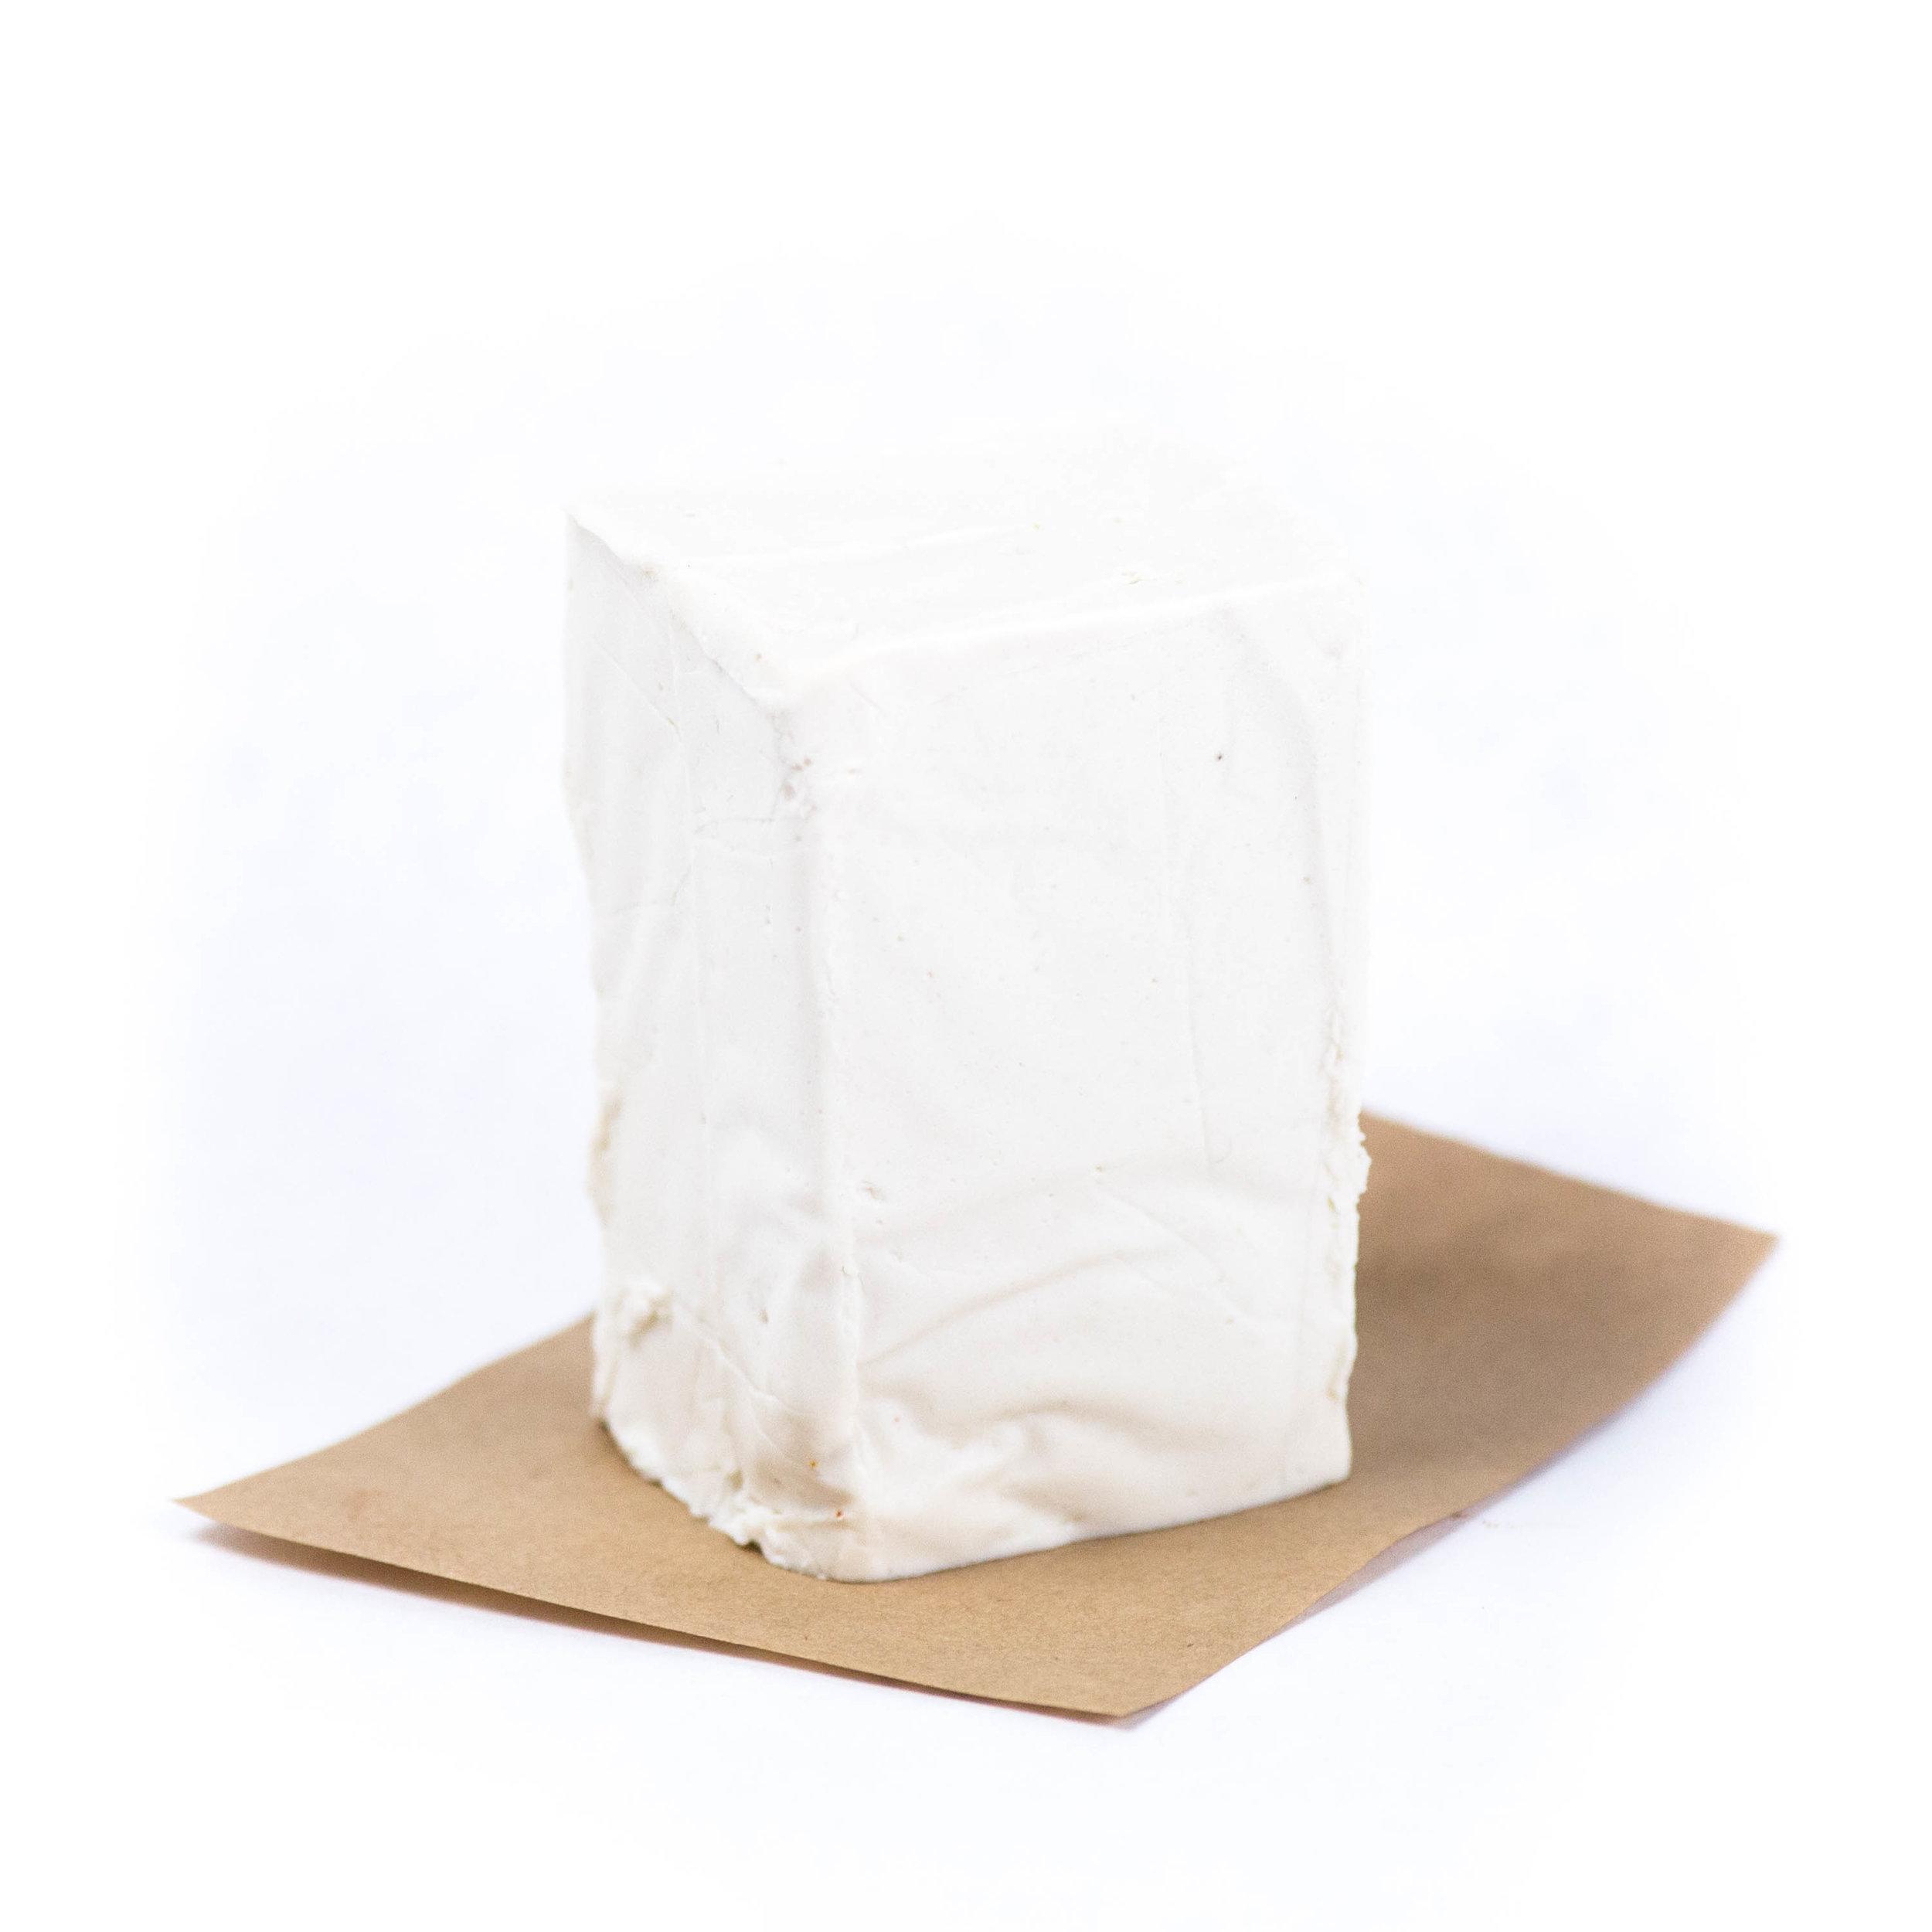 Coconut Mozzarella Retail Pack - $48